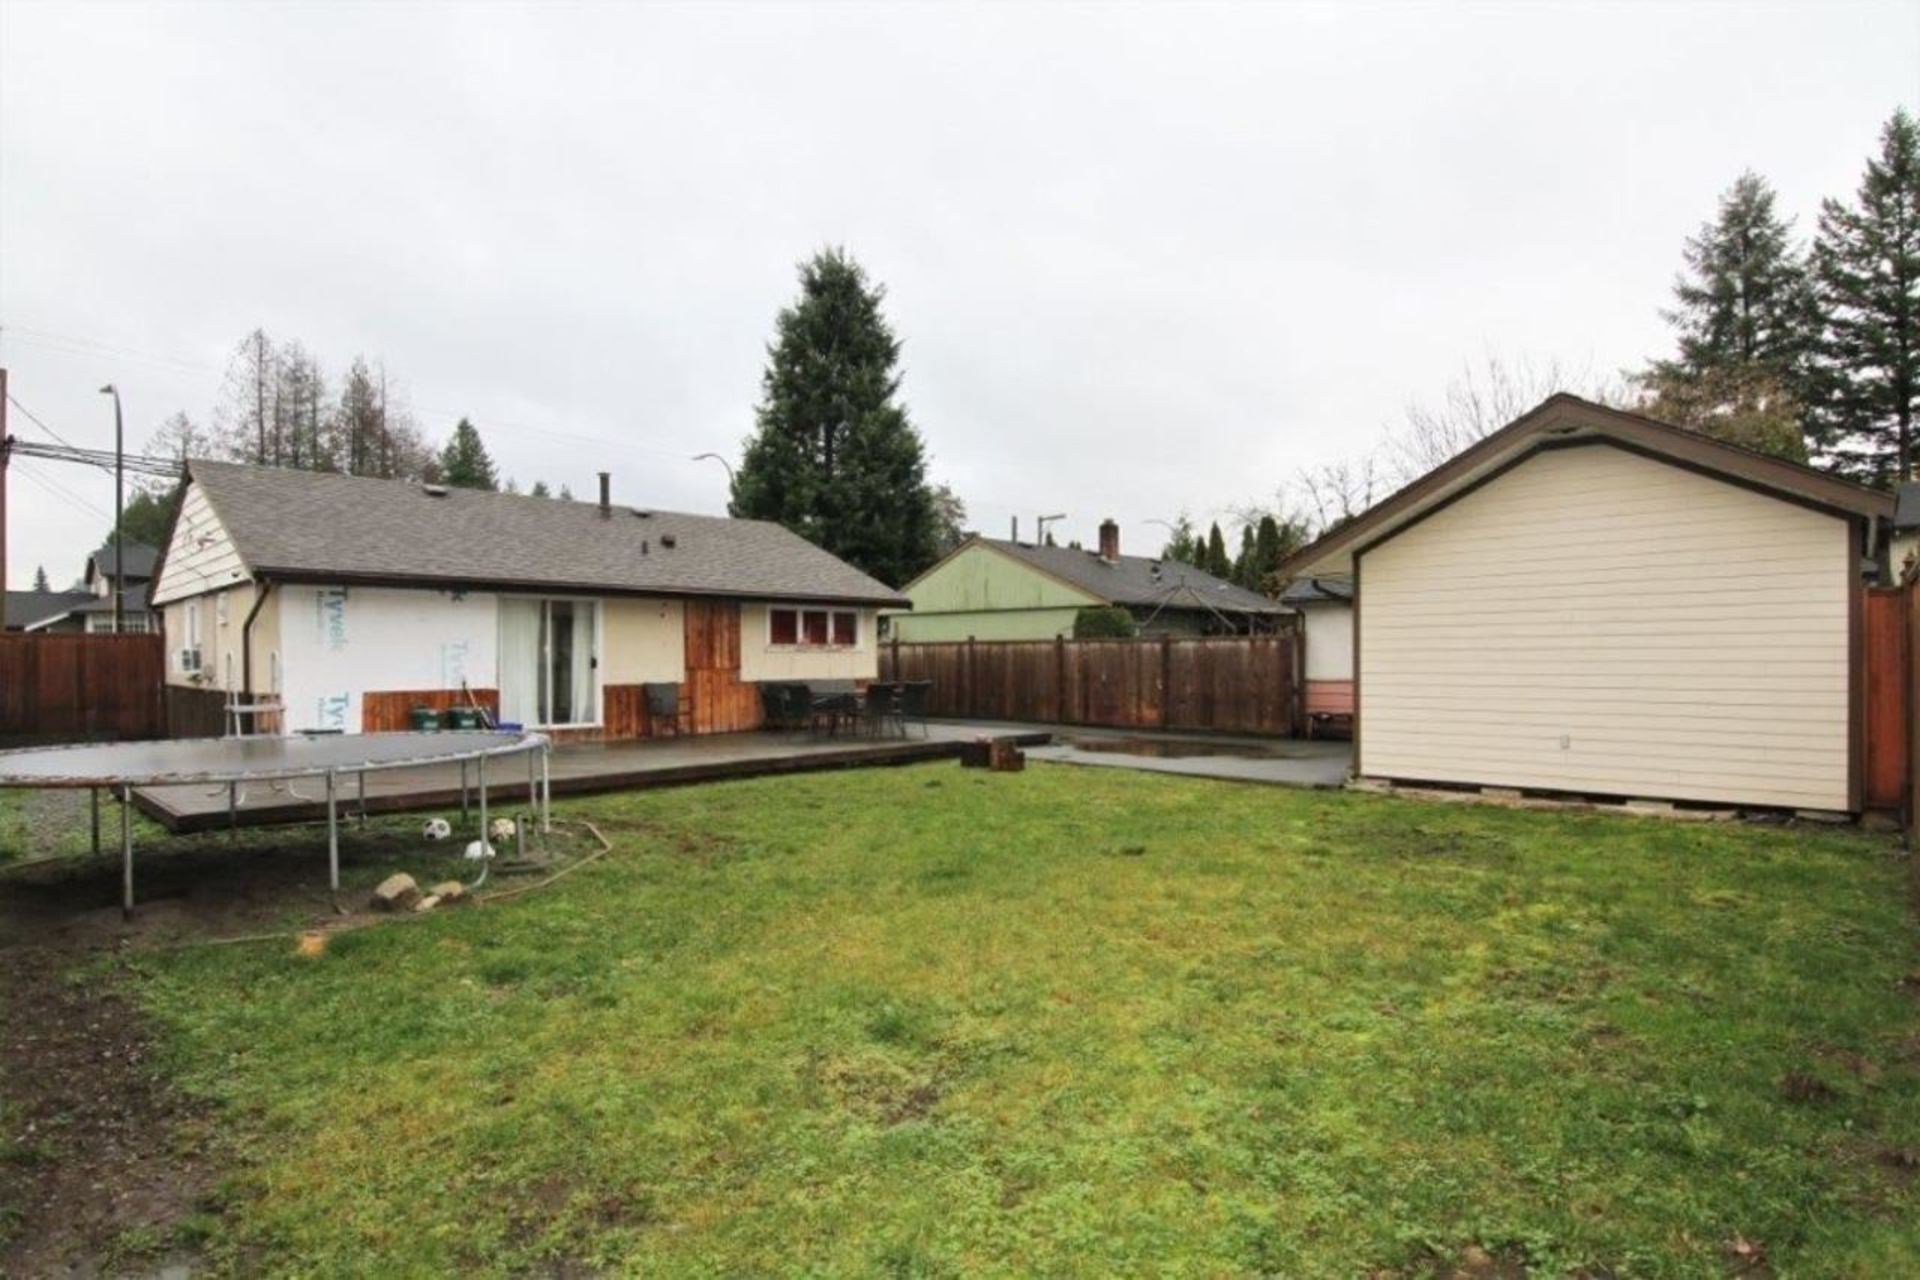 12351-203-street-west-central-maple-ridge-15 at 12351 203 Street, West Central, Maple Ridge